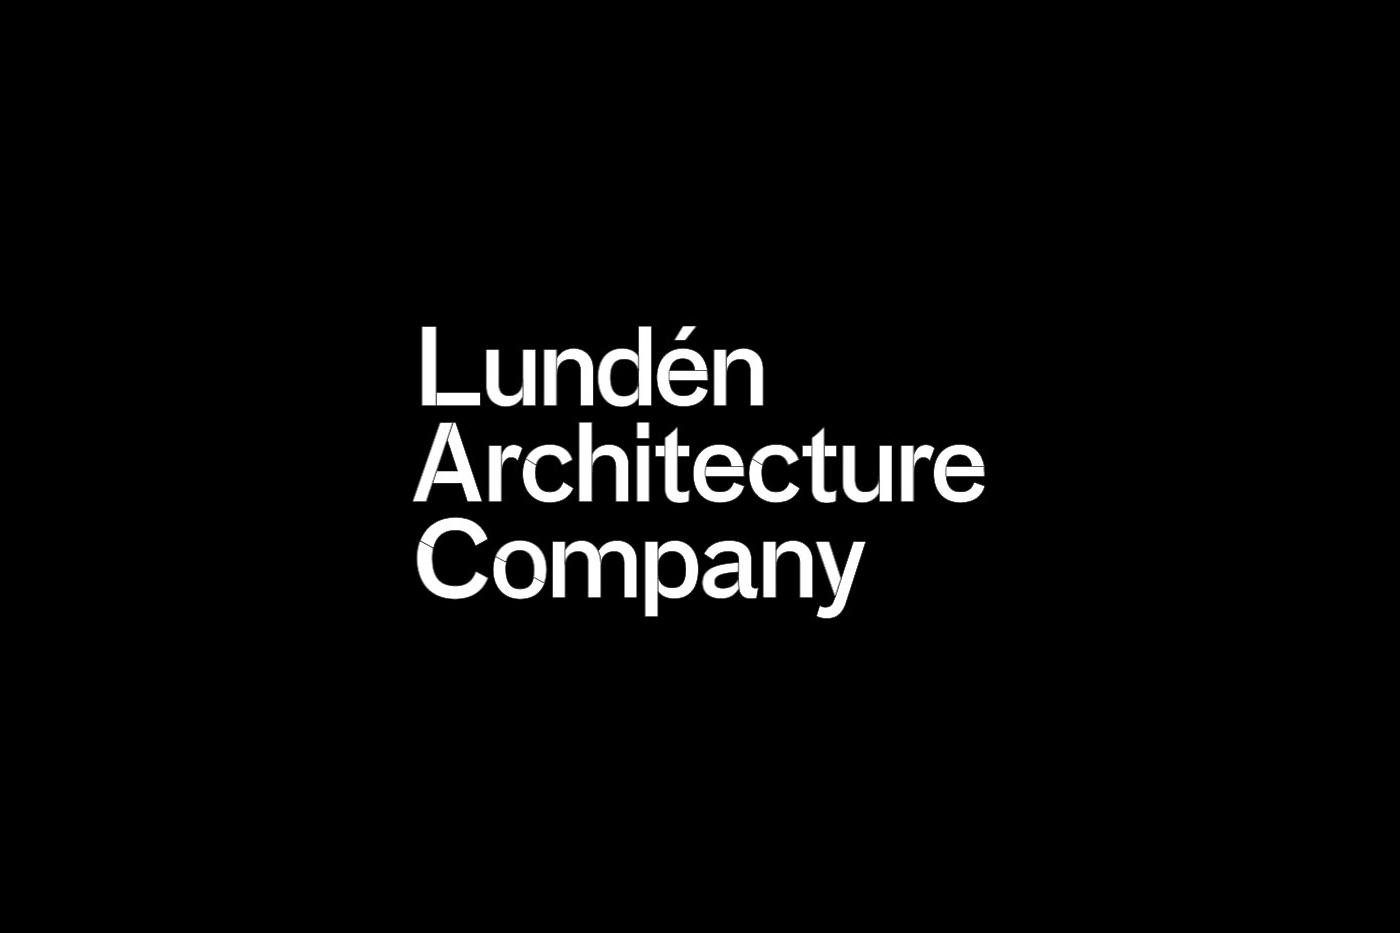 Logotype by Finnish design studio Tsto for Helsinki-based Lundén Architecture Company